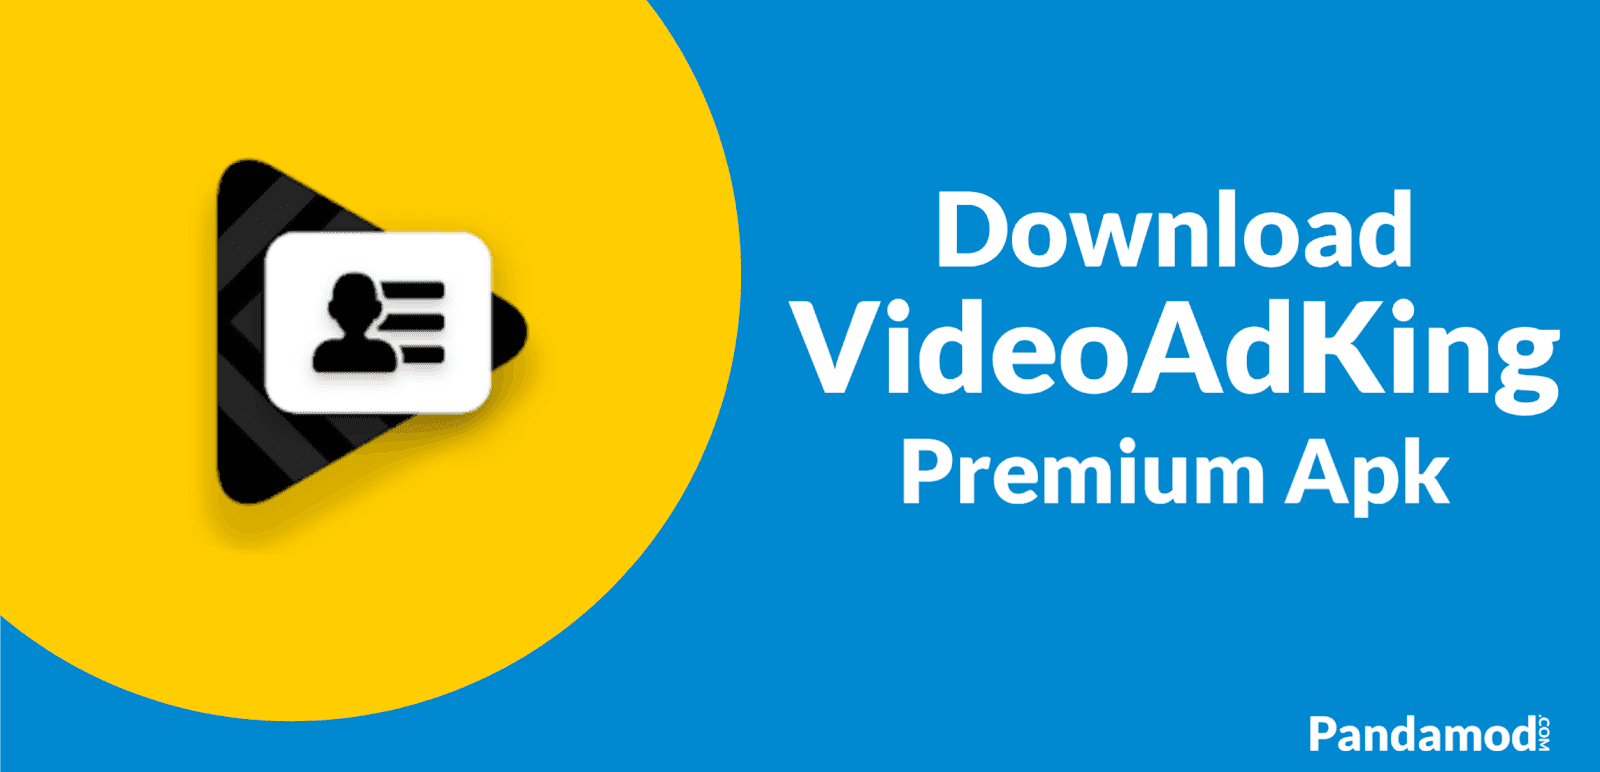 VideoAdKing - Intro Maker, Video Ad Maker v13 0 [PRO] APK Download